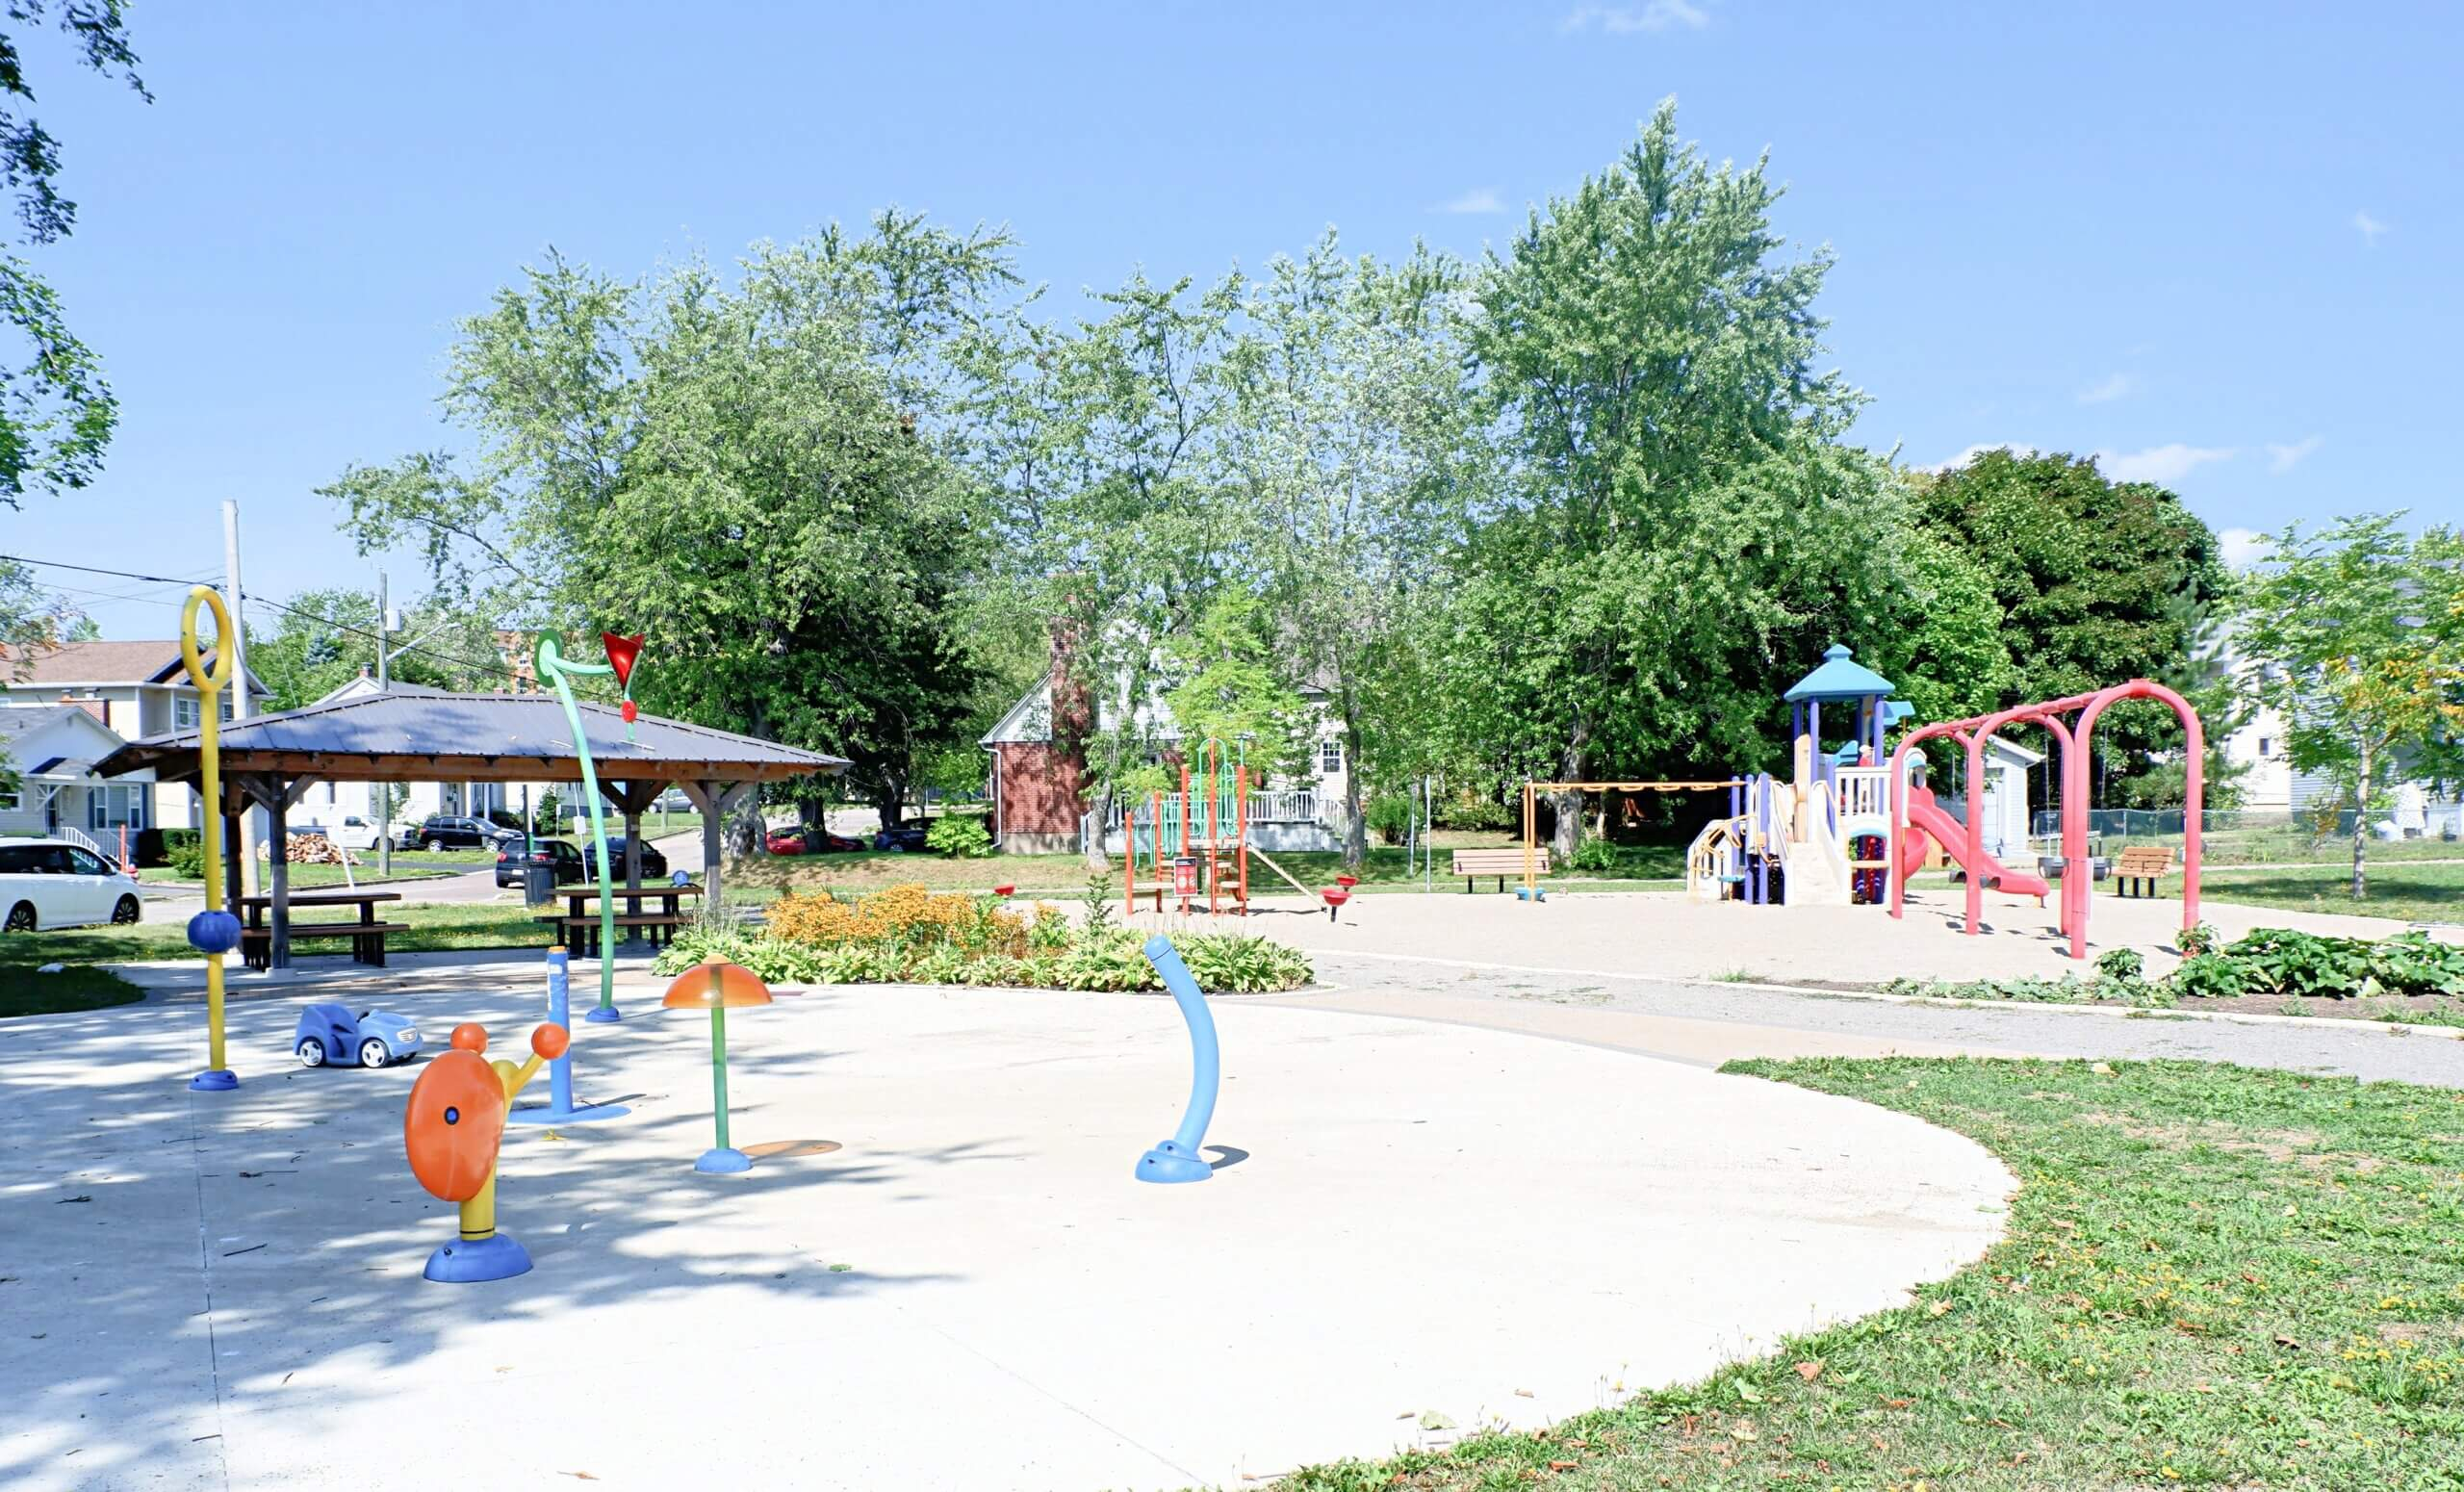 Braemar Park Centre Street Playground Moncton Pickle Planet splash pad